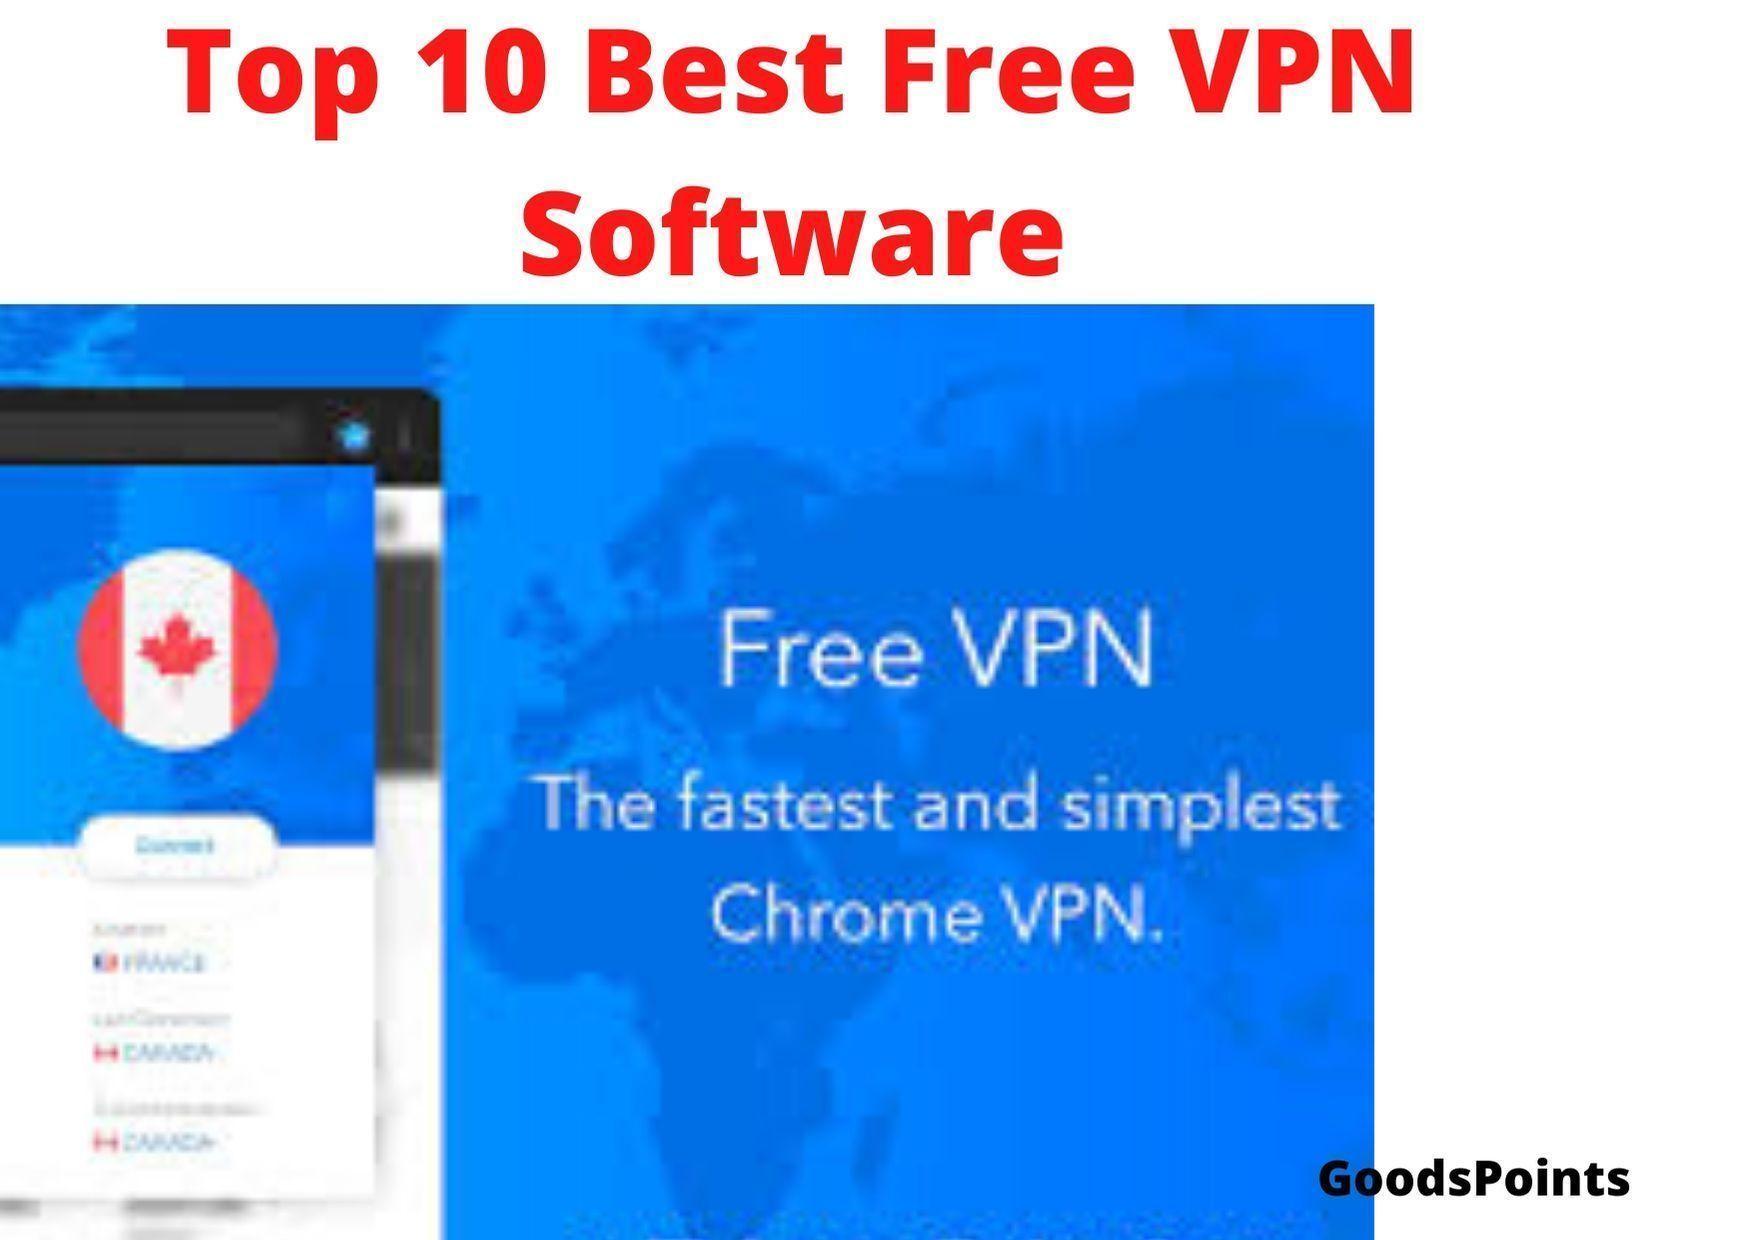 c17339e894d90aa888773c6a1d48f19d - The Best Vpn Software For Pc